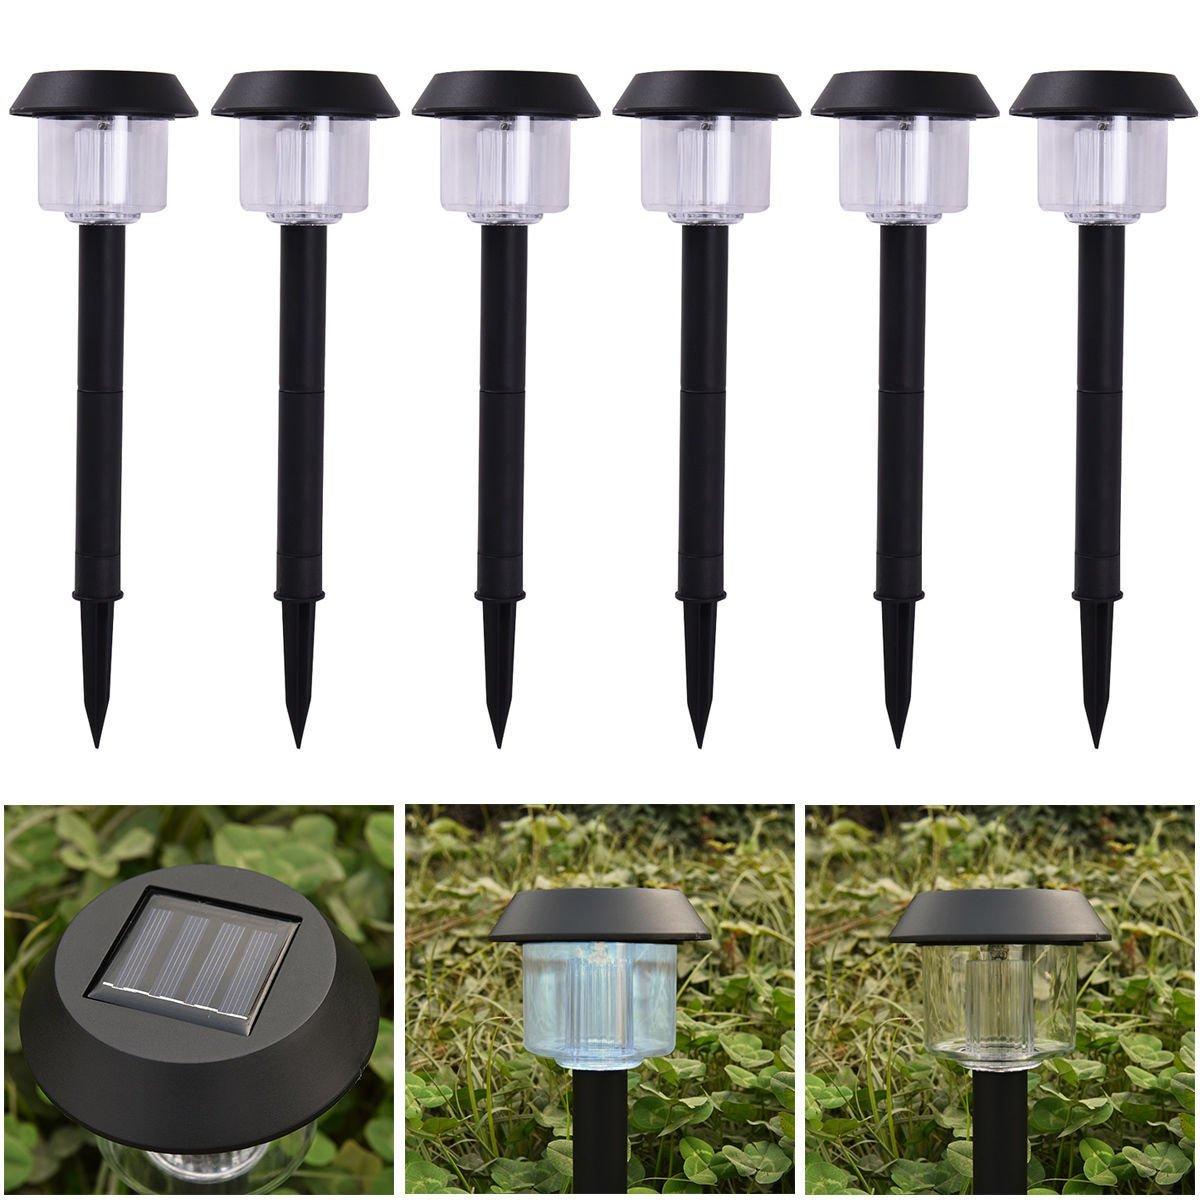 MAZIMARK--6 LED Solar Power Outdoor Path Light Spot Lamp Yard Garden Lawn Landscape White